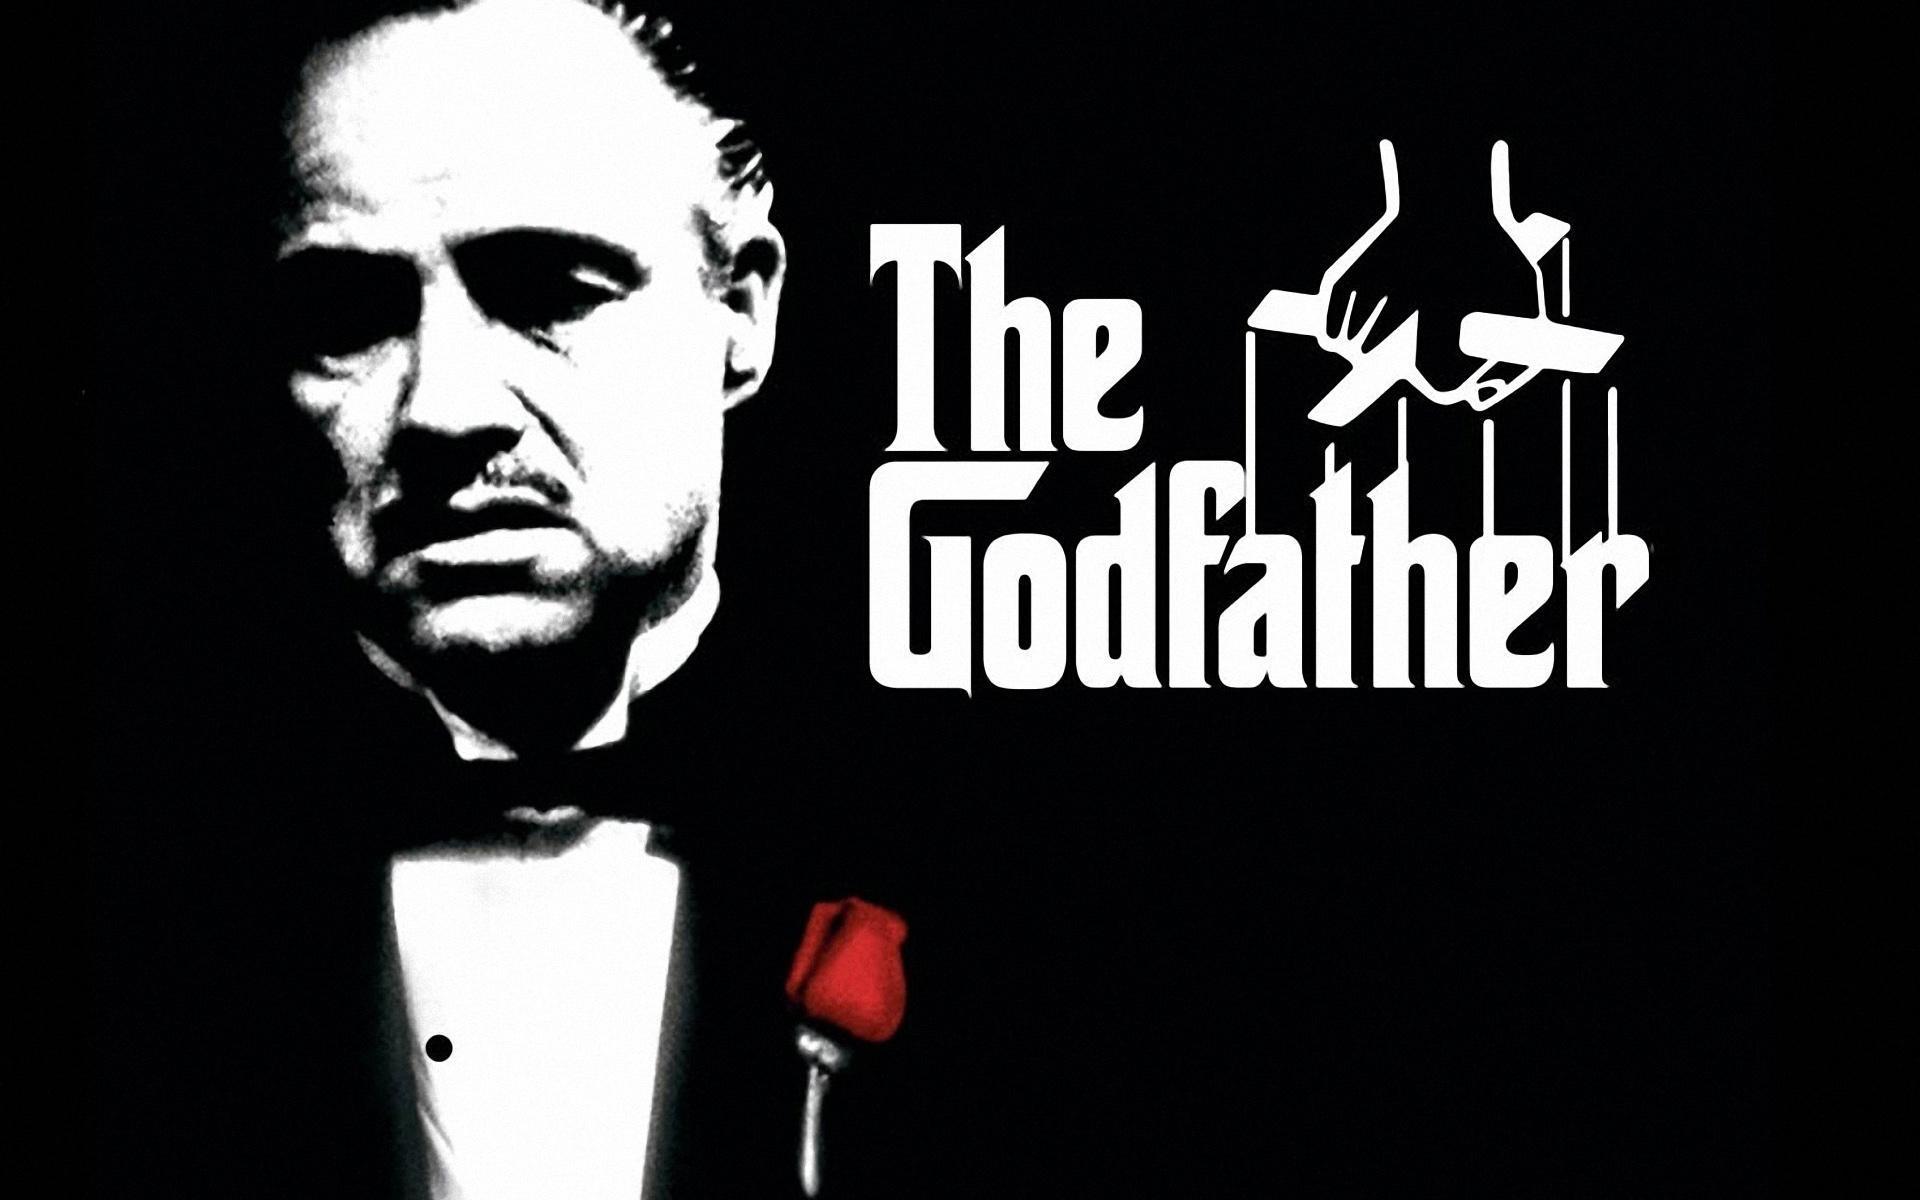 Godfather wallpaper - 778815